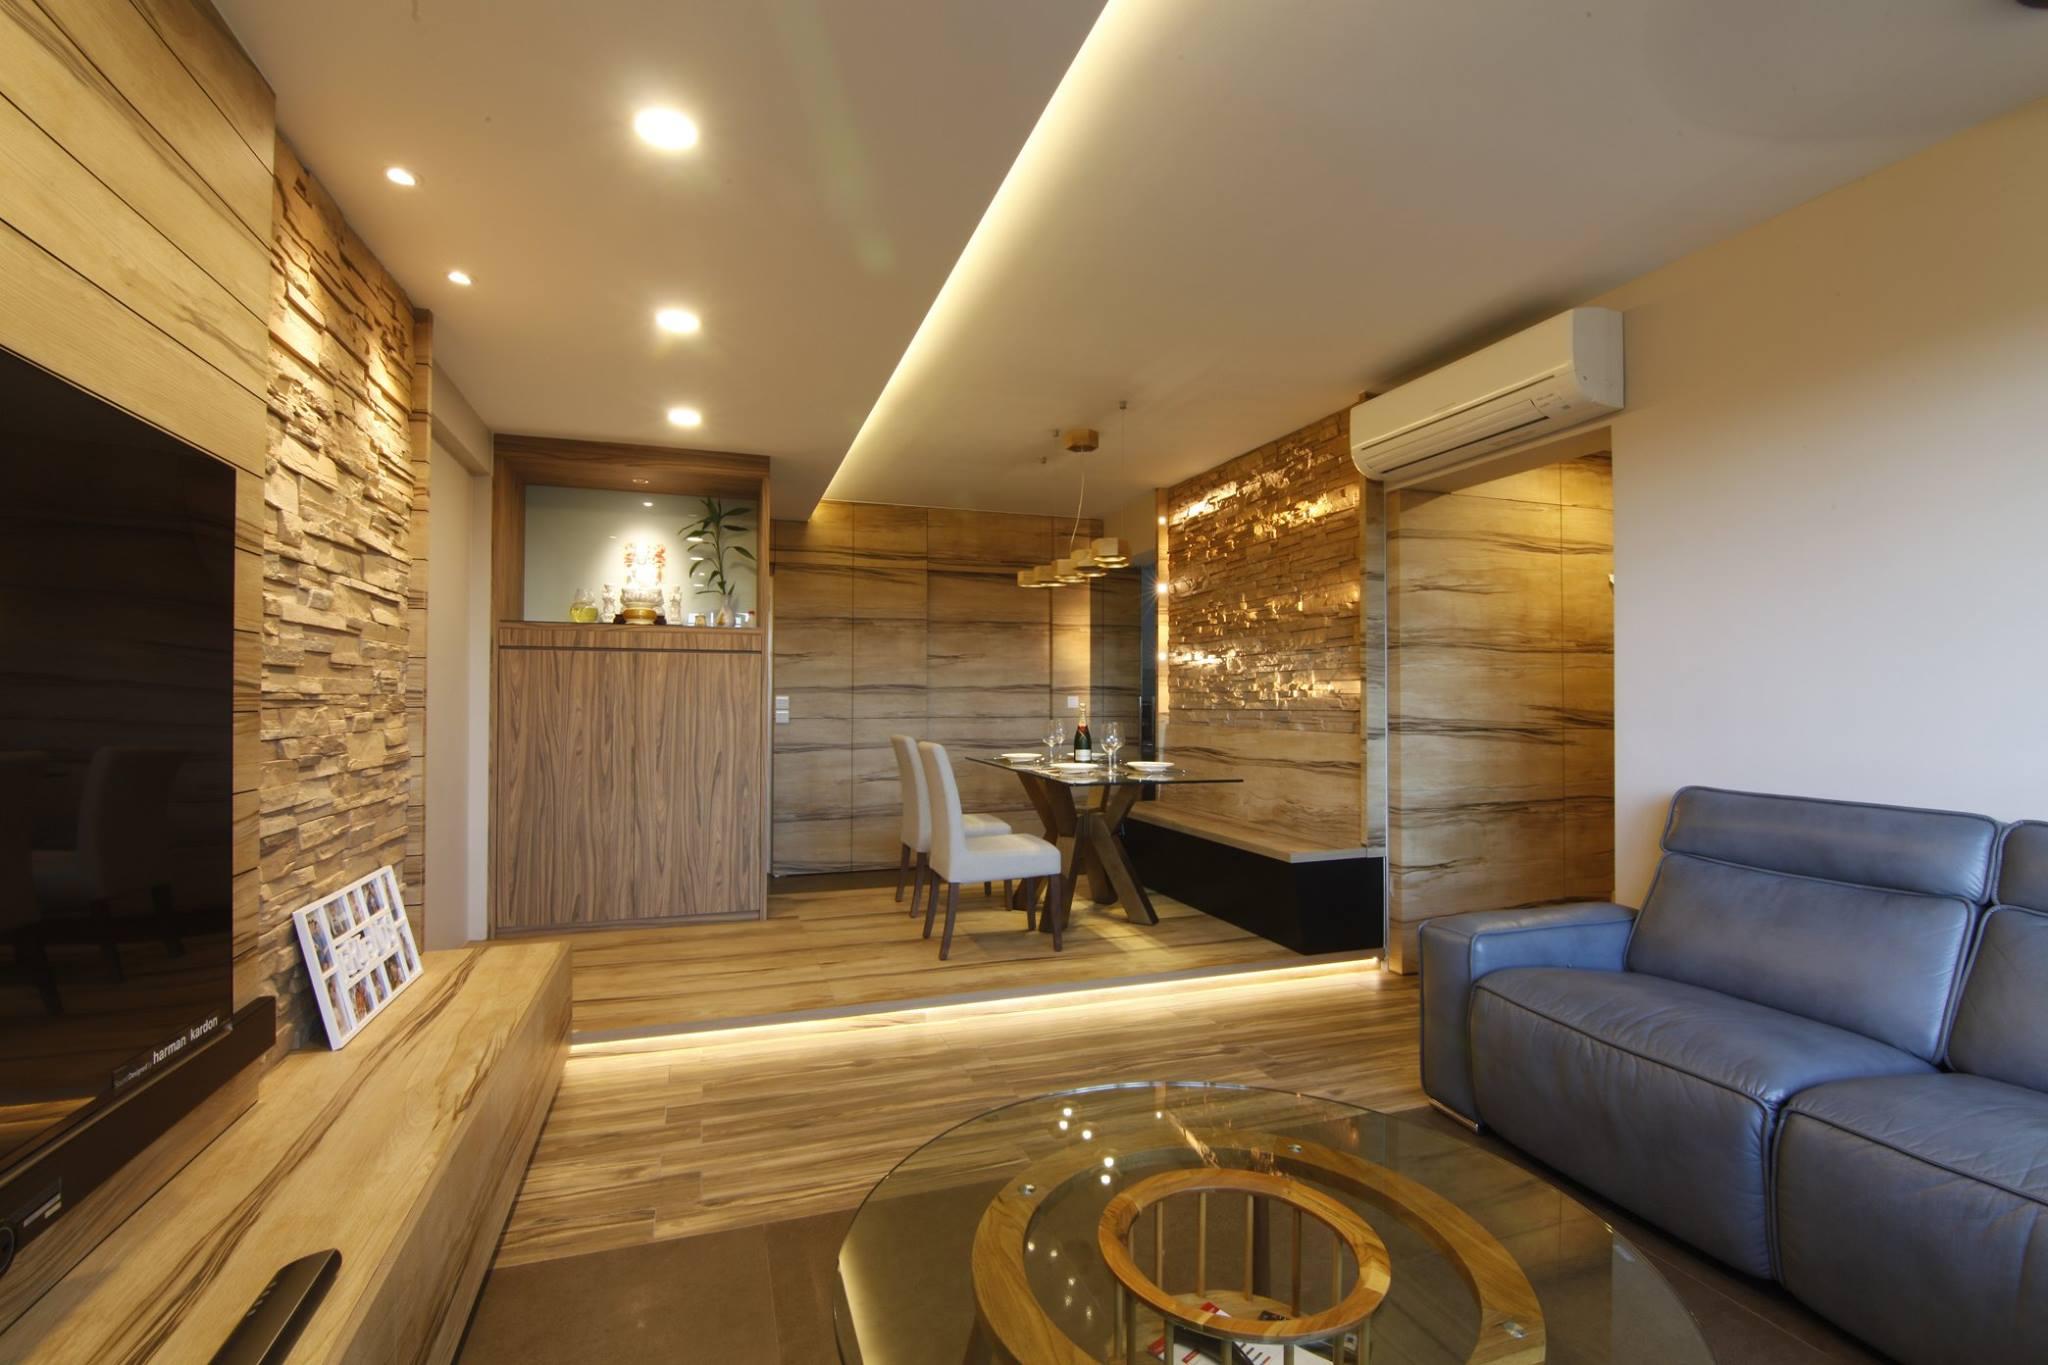 5 Ceiling Designs That Define The Interior